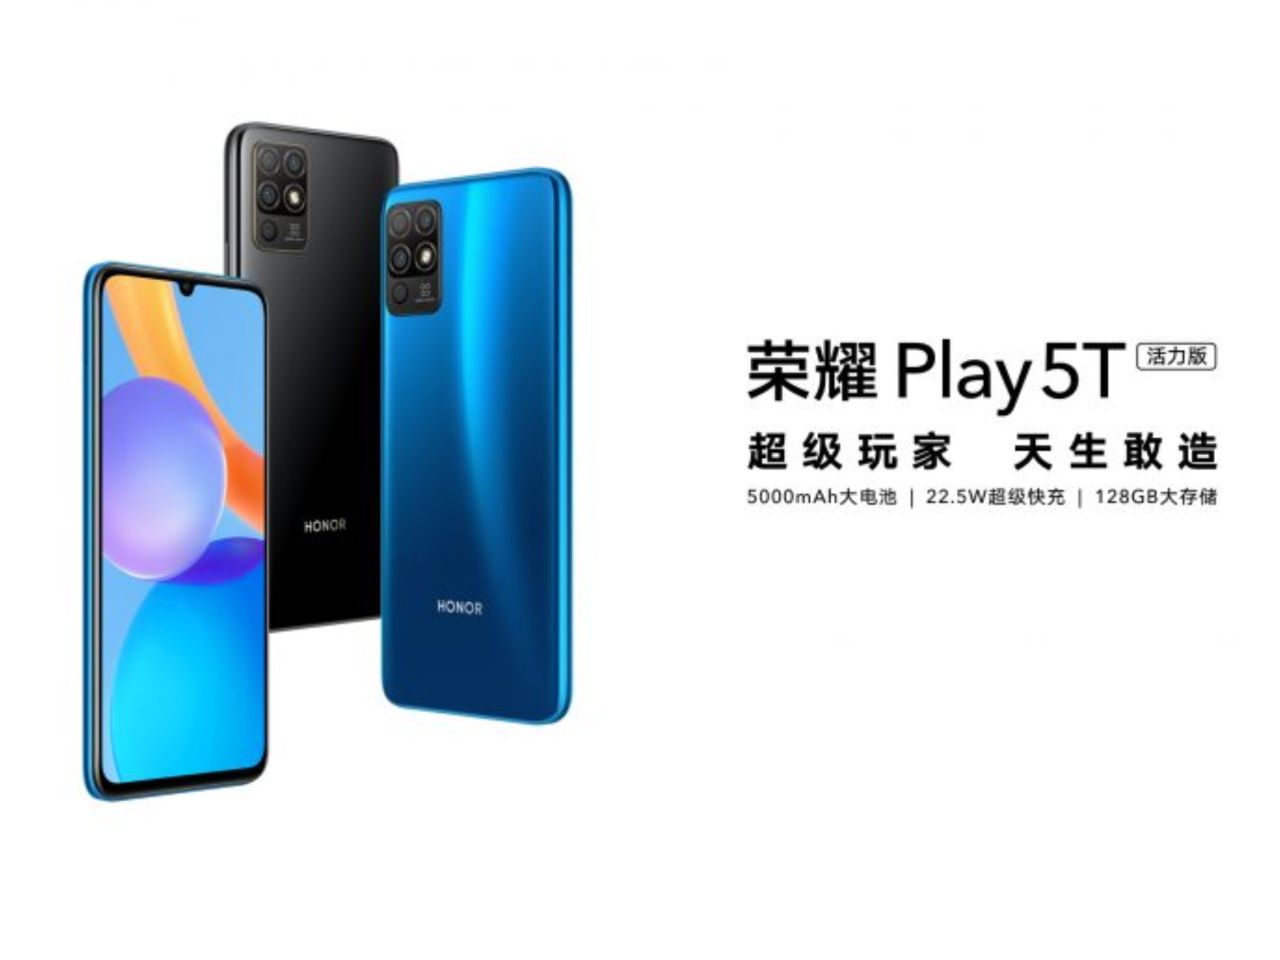 گوشی Honor Play 5T Vitality Edition